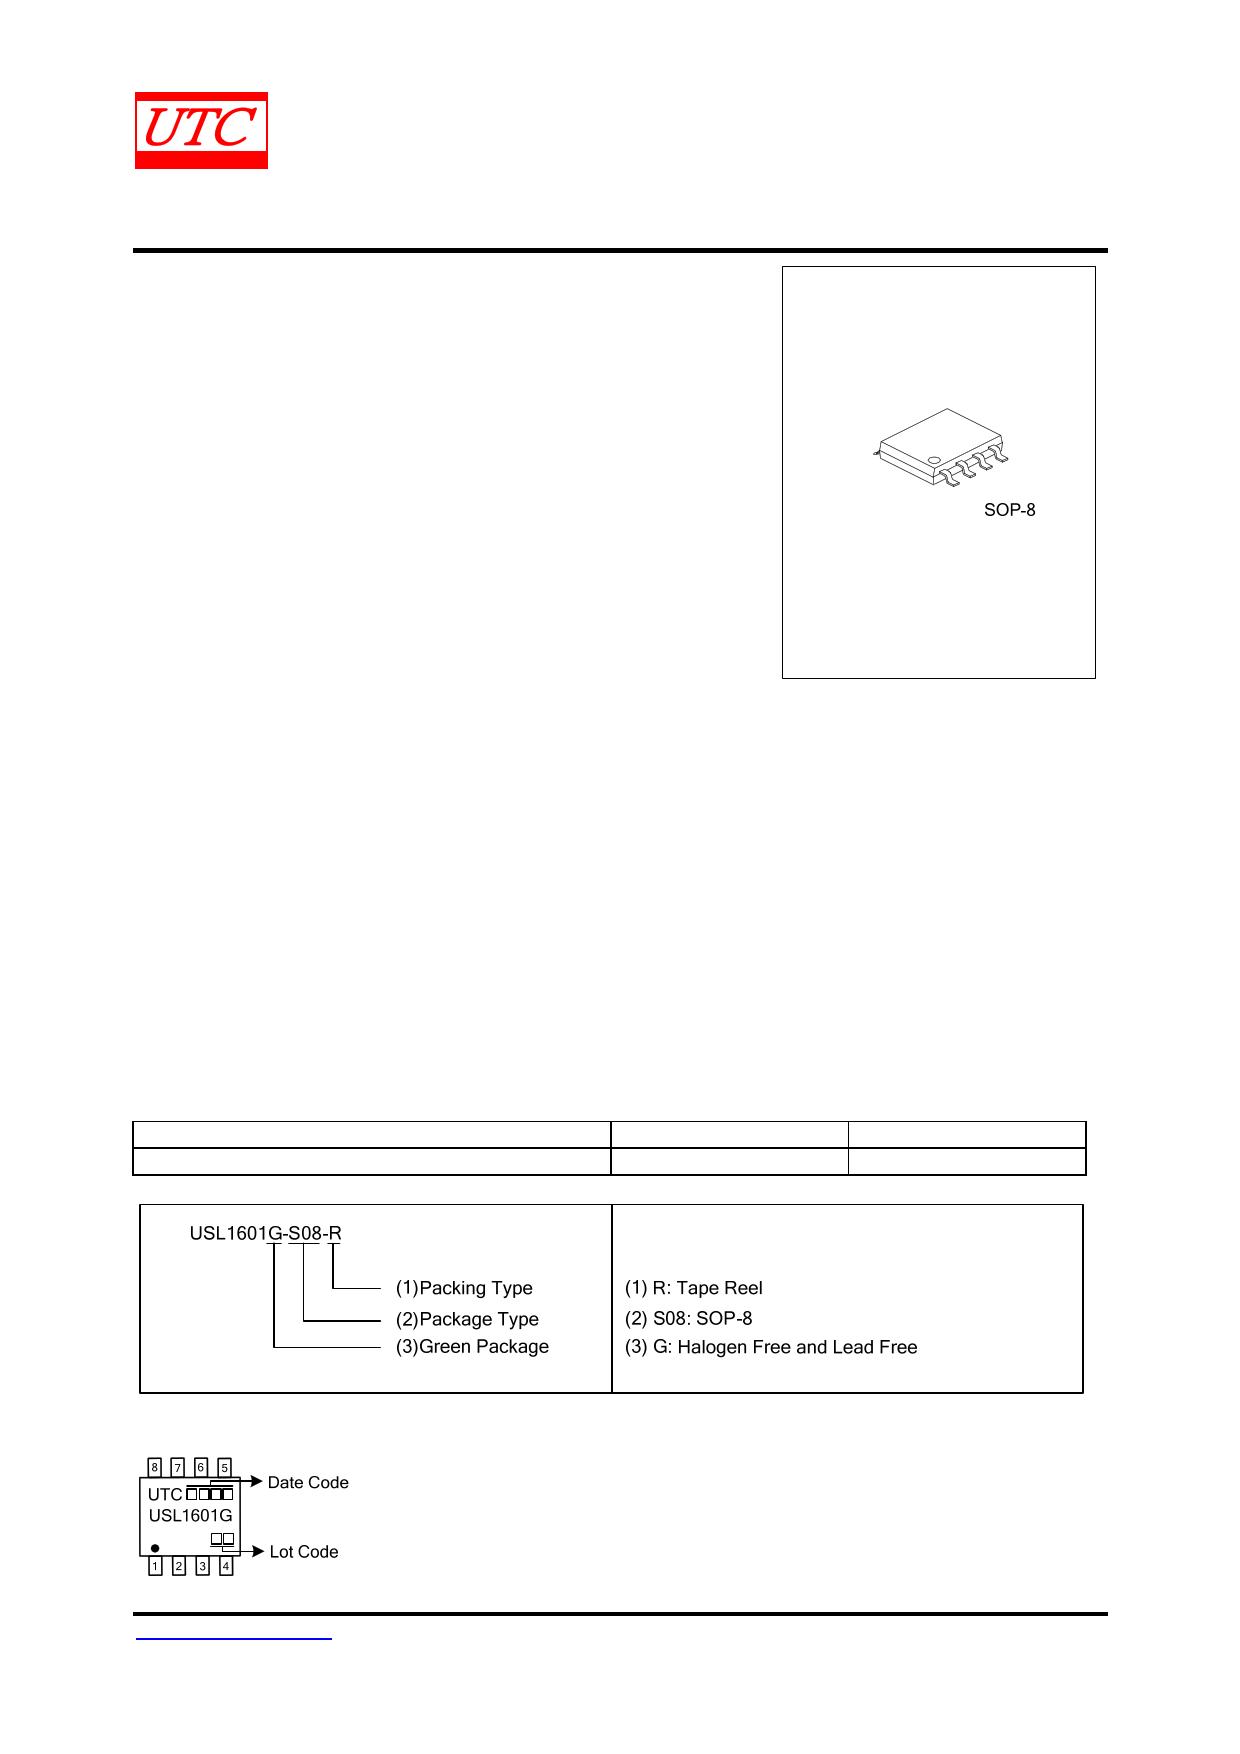 USL1601 datasheet